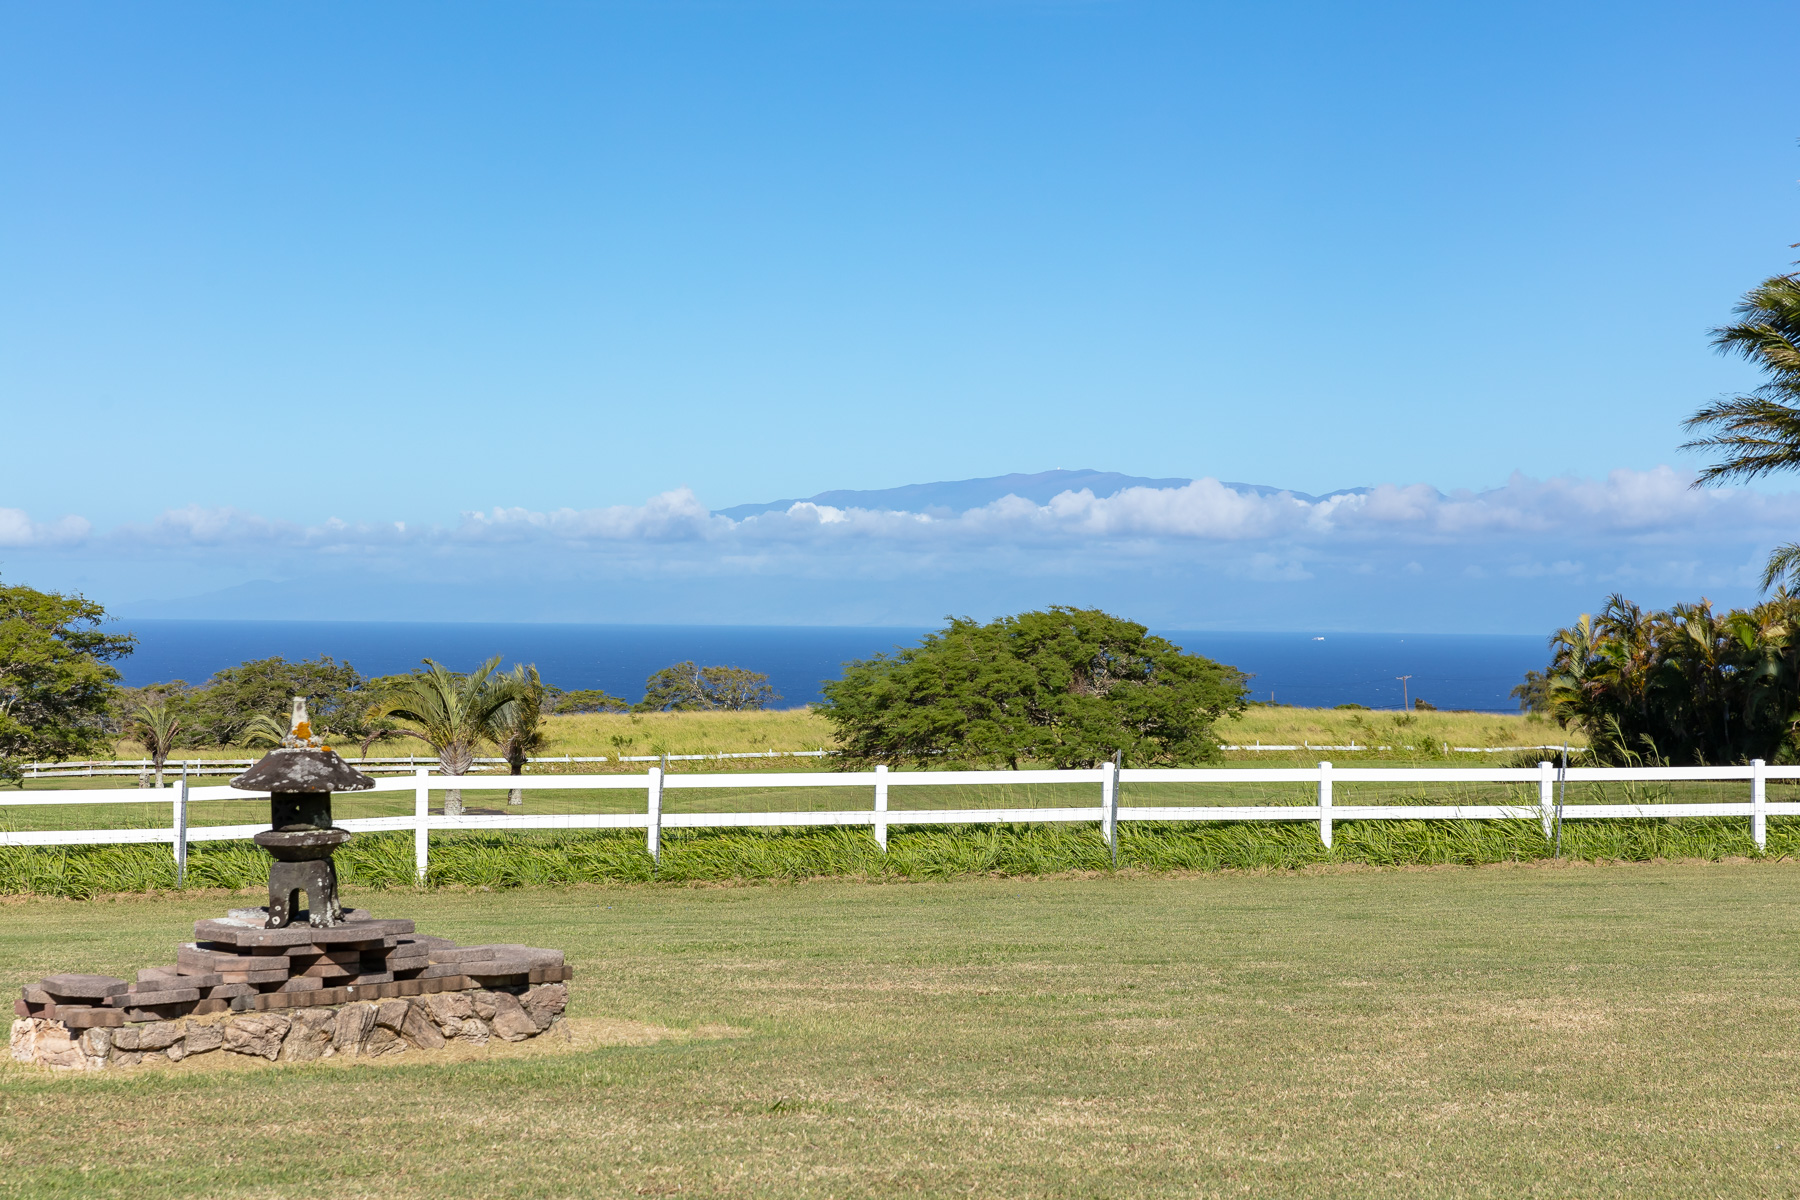 Single Family Home for Active at Puakea Bay Ranch Subdivision 56-2878 Puakea Bay Dr. Hawi, Hawaii 96719 United States